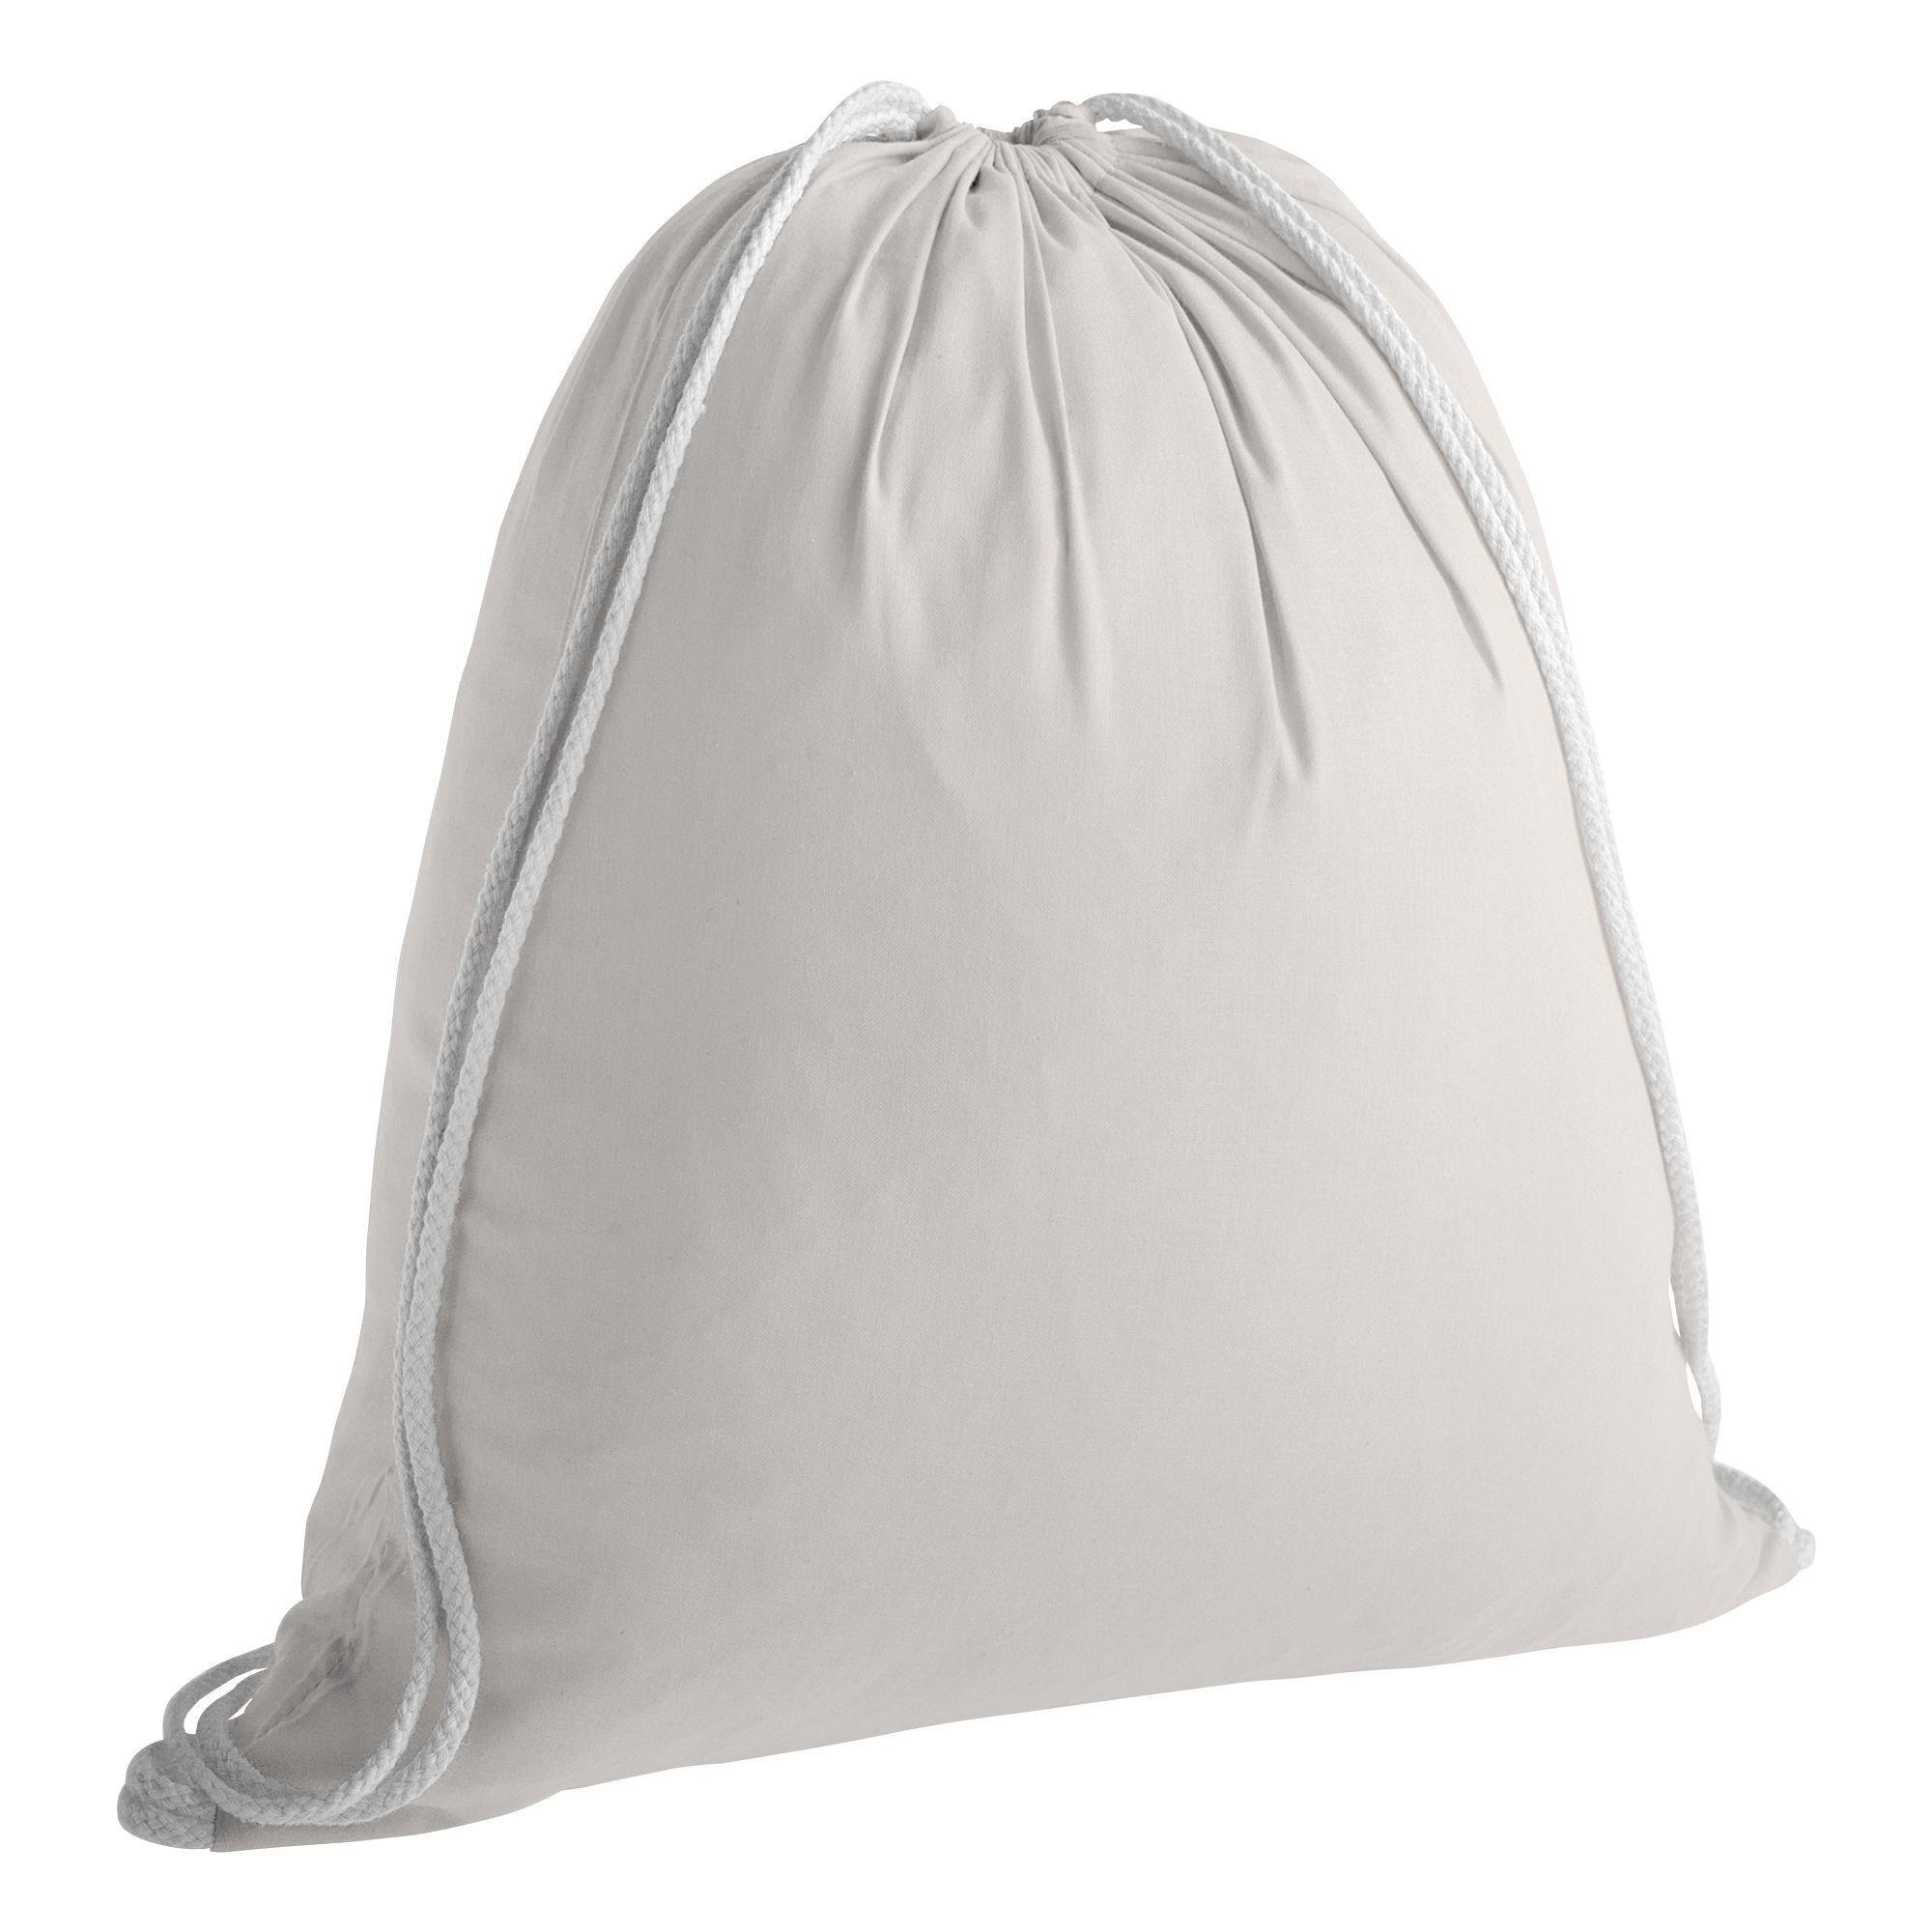 Рюкзак Canvas, неокрашенный